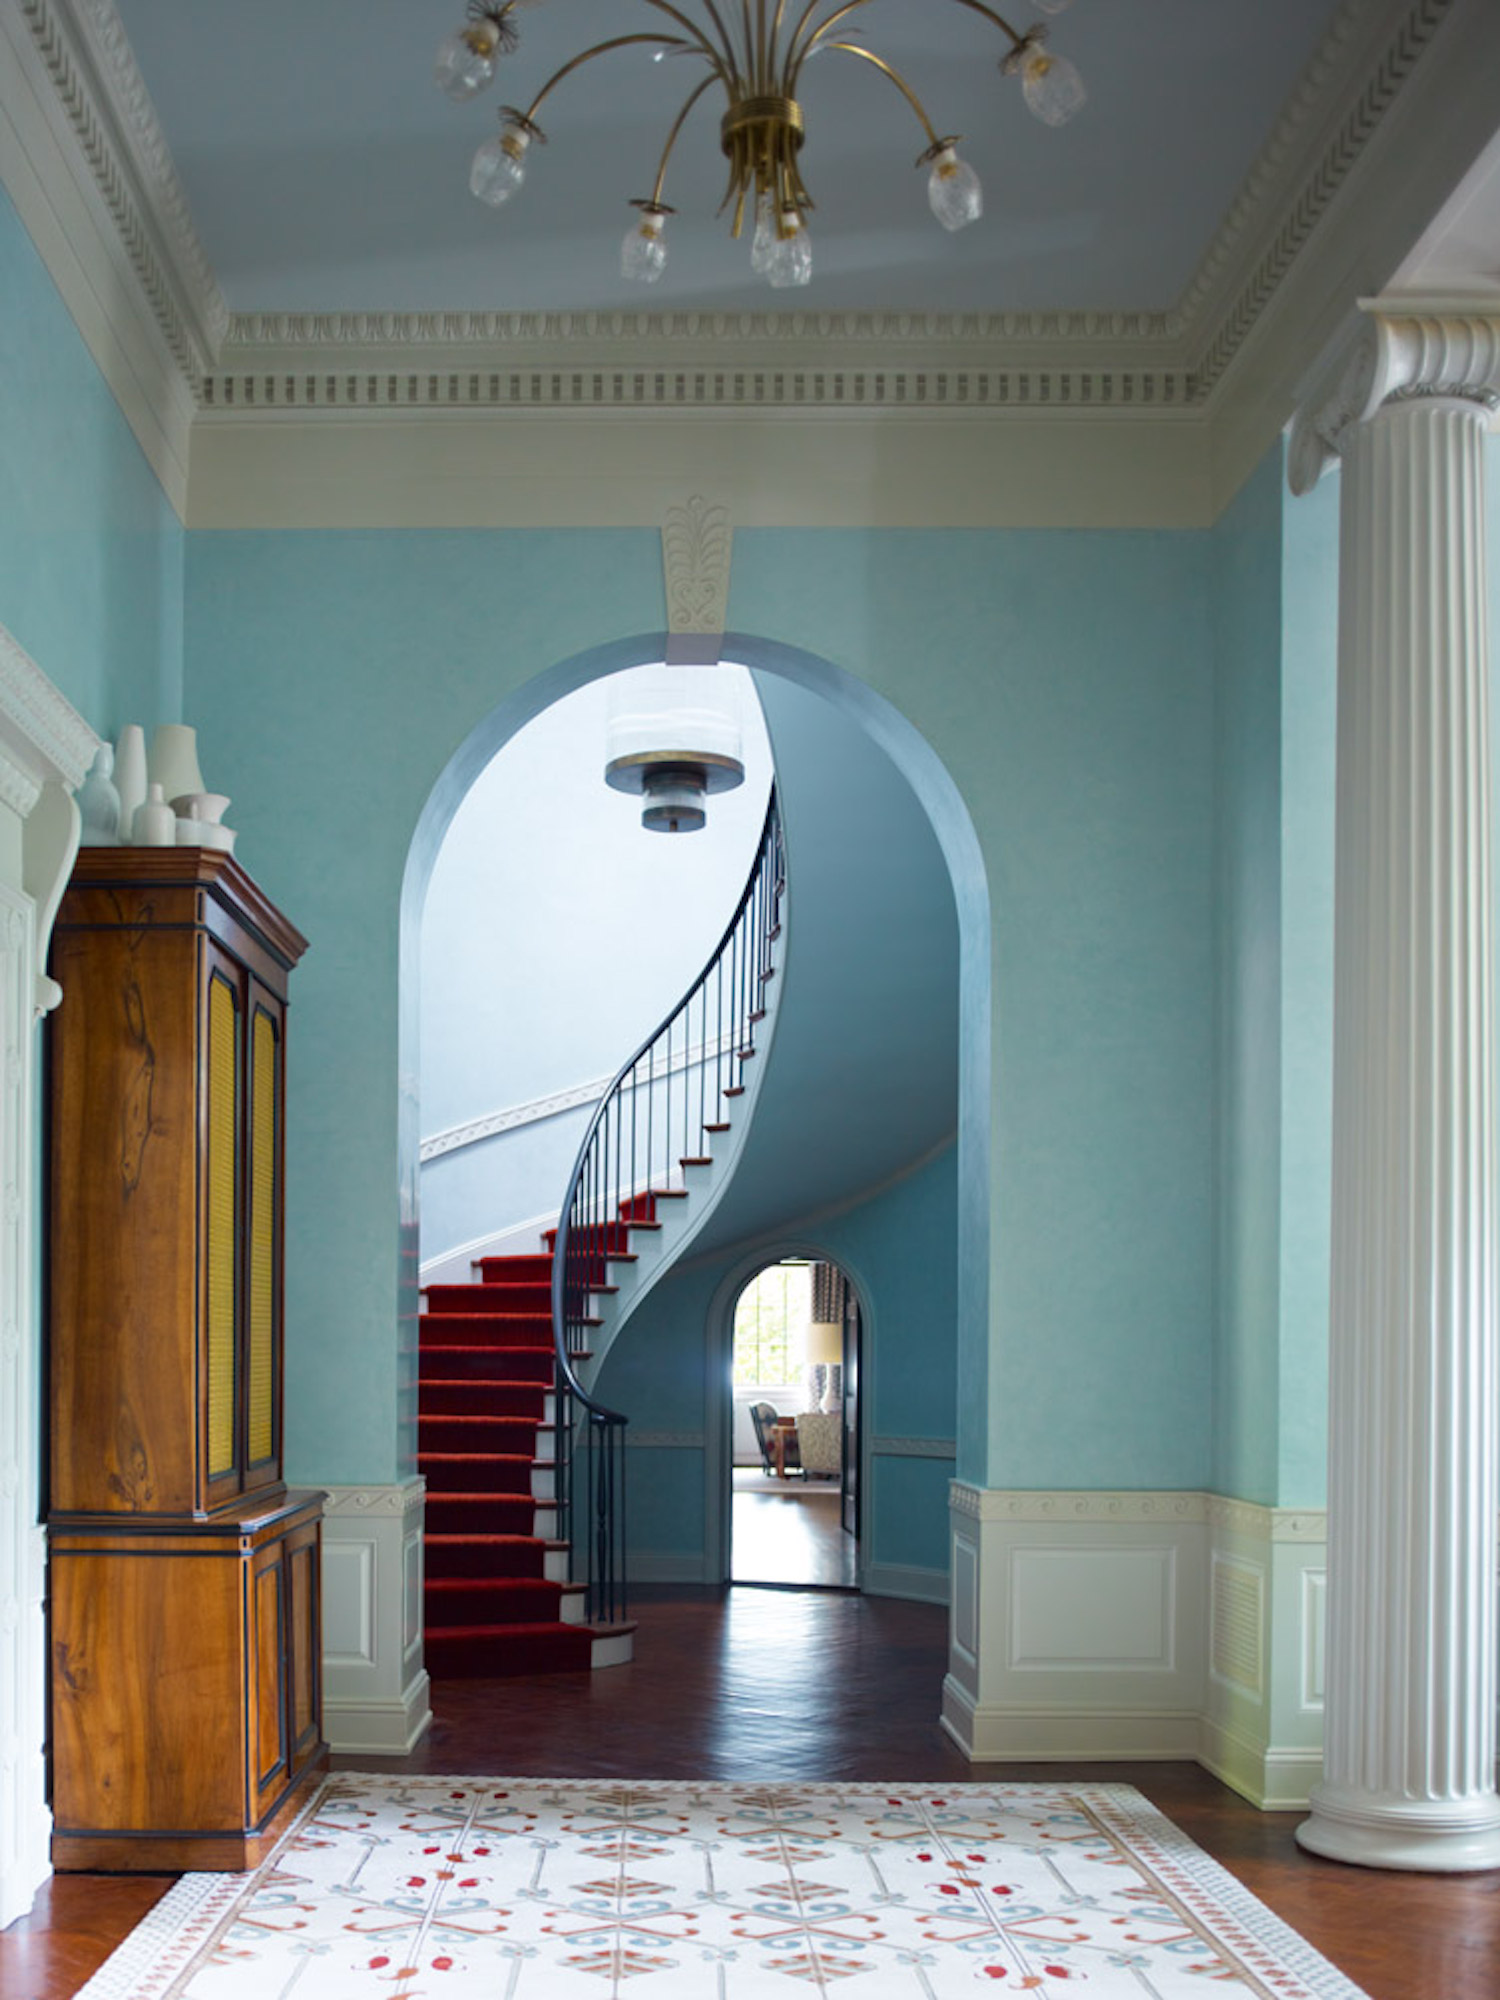 0901_stair hall.jpg